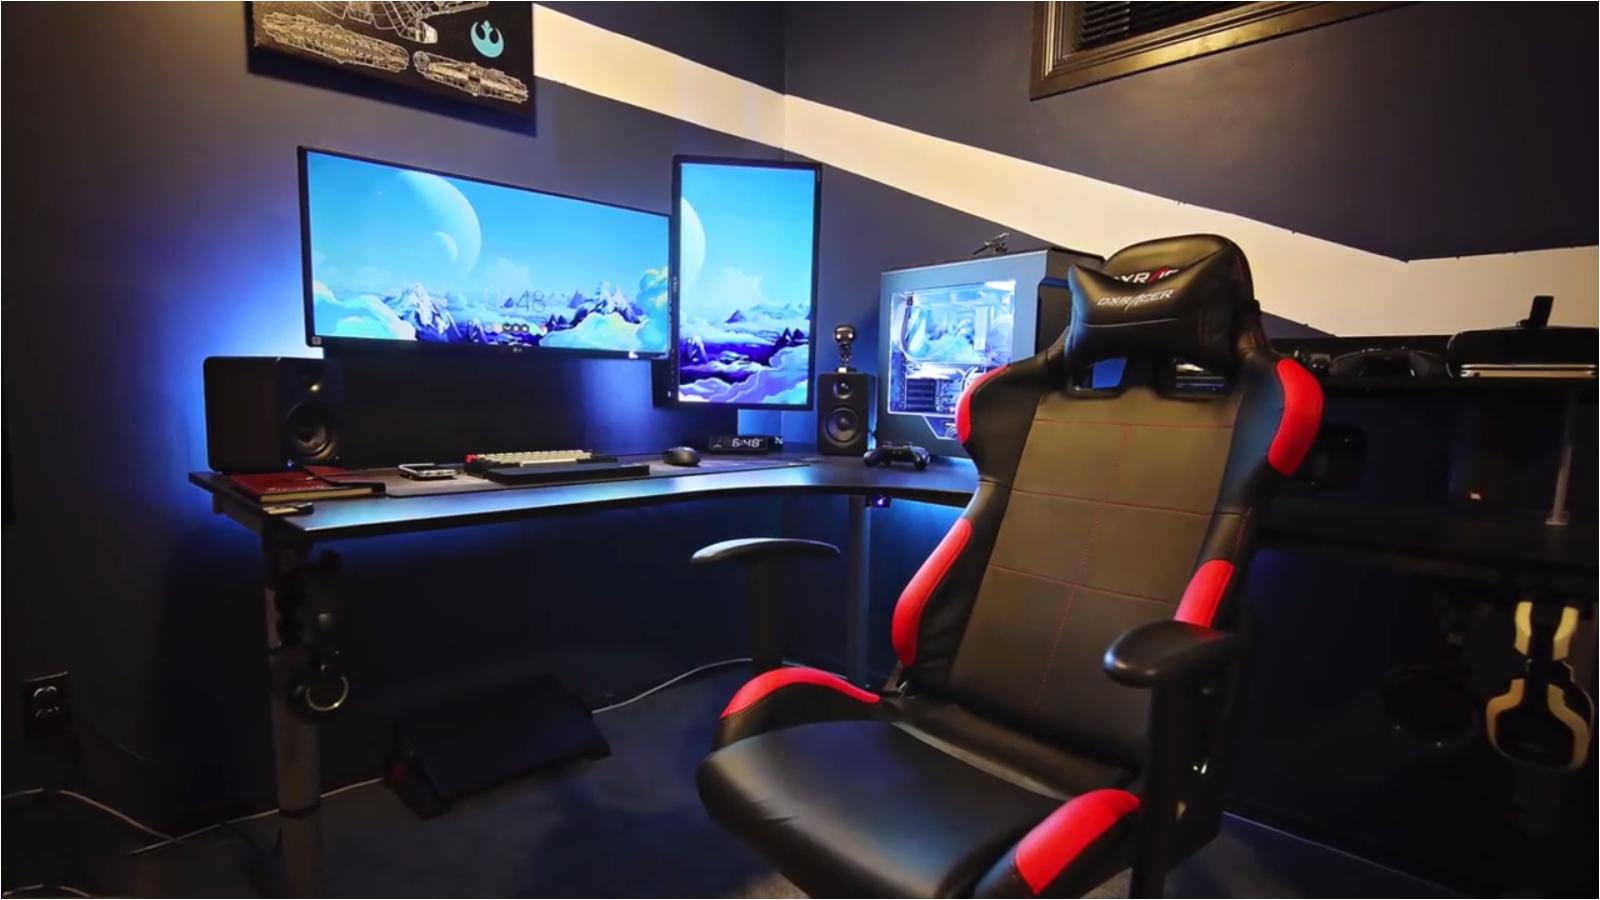 gaming rooms gaming desk gaming setup media rooms lighting games